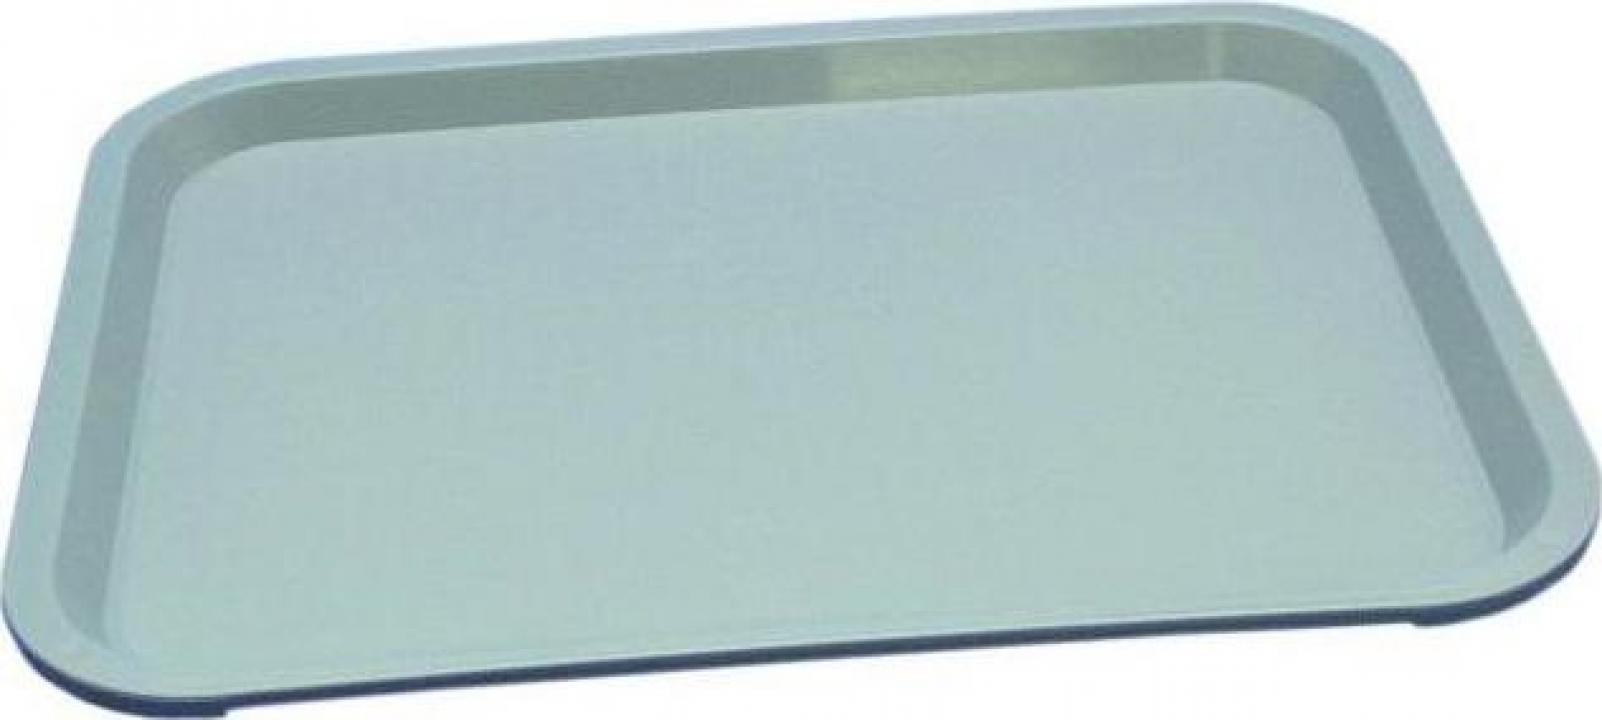 Tava pentru foodcourt PP gri, 41.5x31 cm